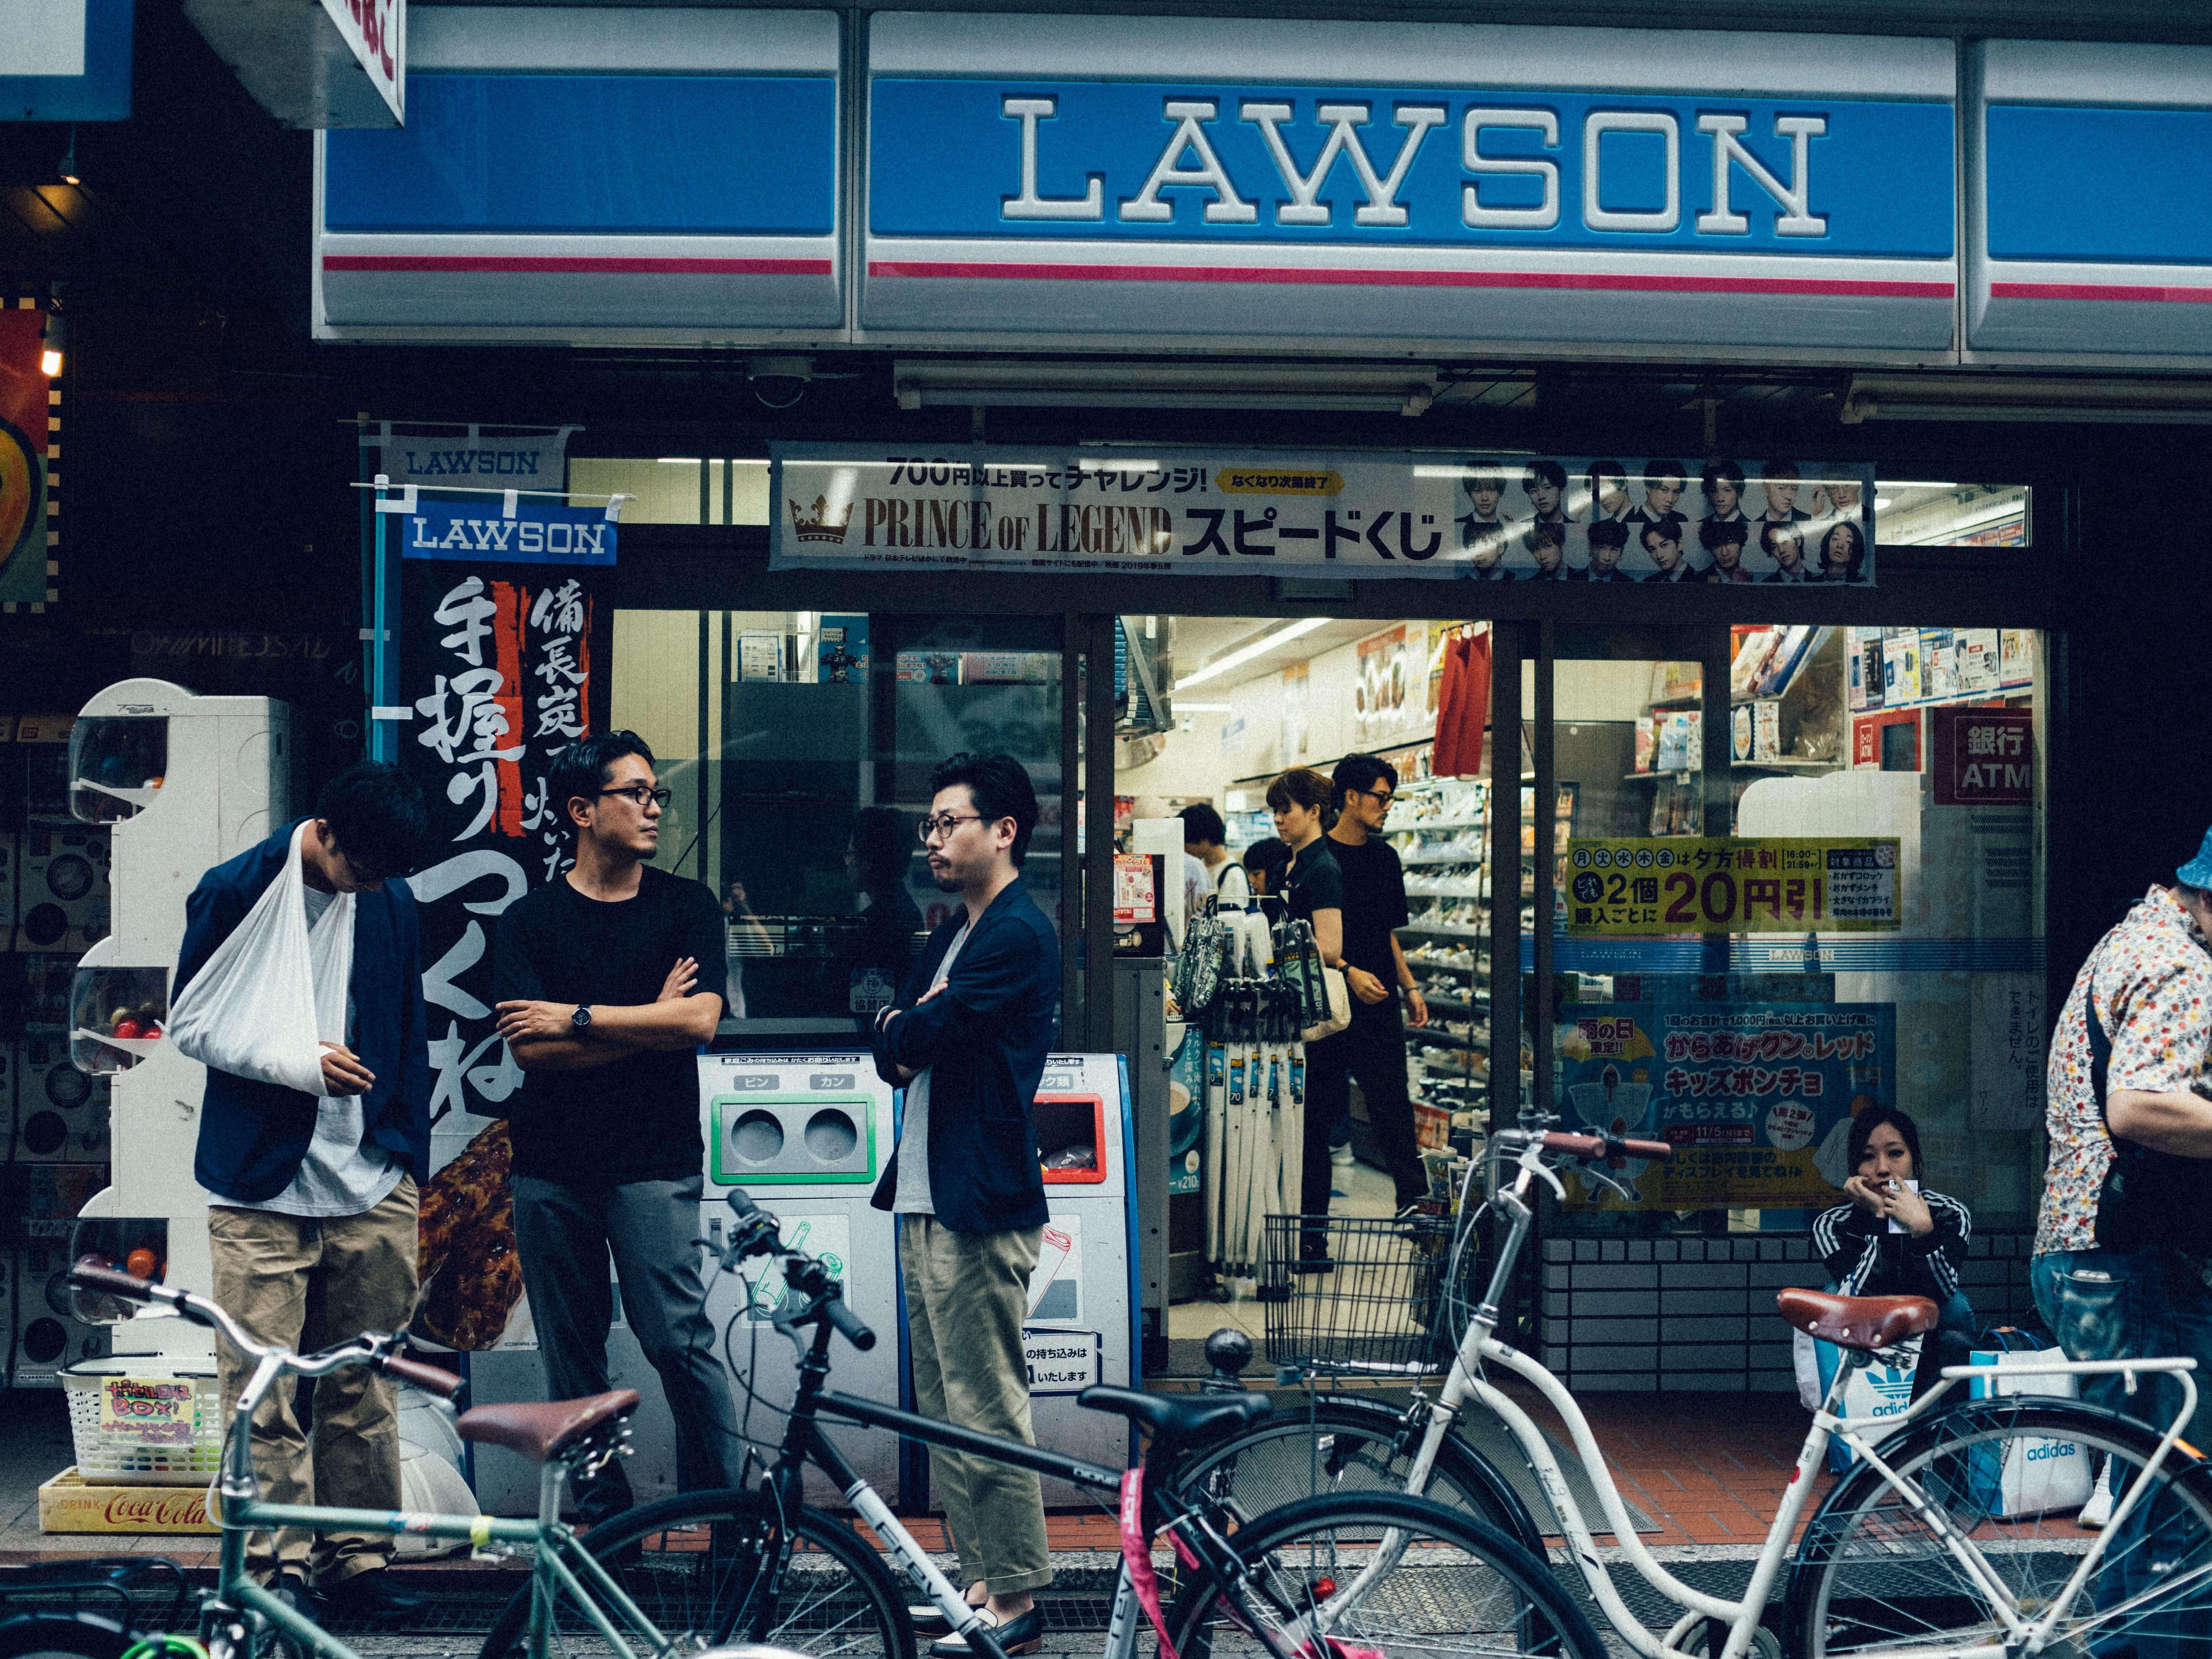 Shopping Brand Zhongbai Lawson Raises Tens of Millions of Yuan in Series B